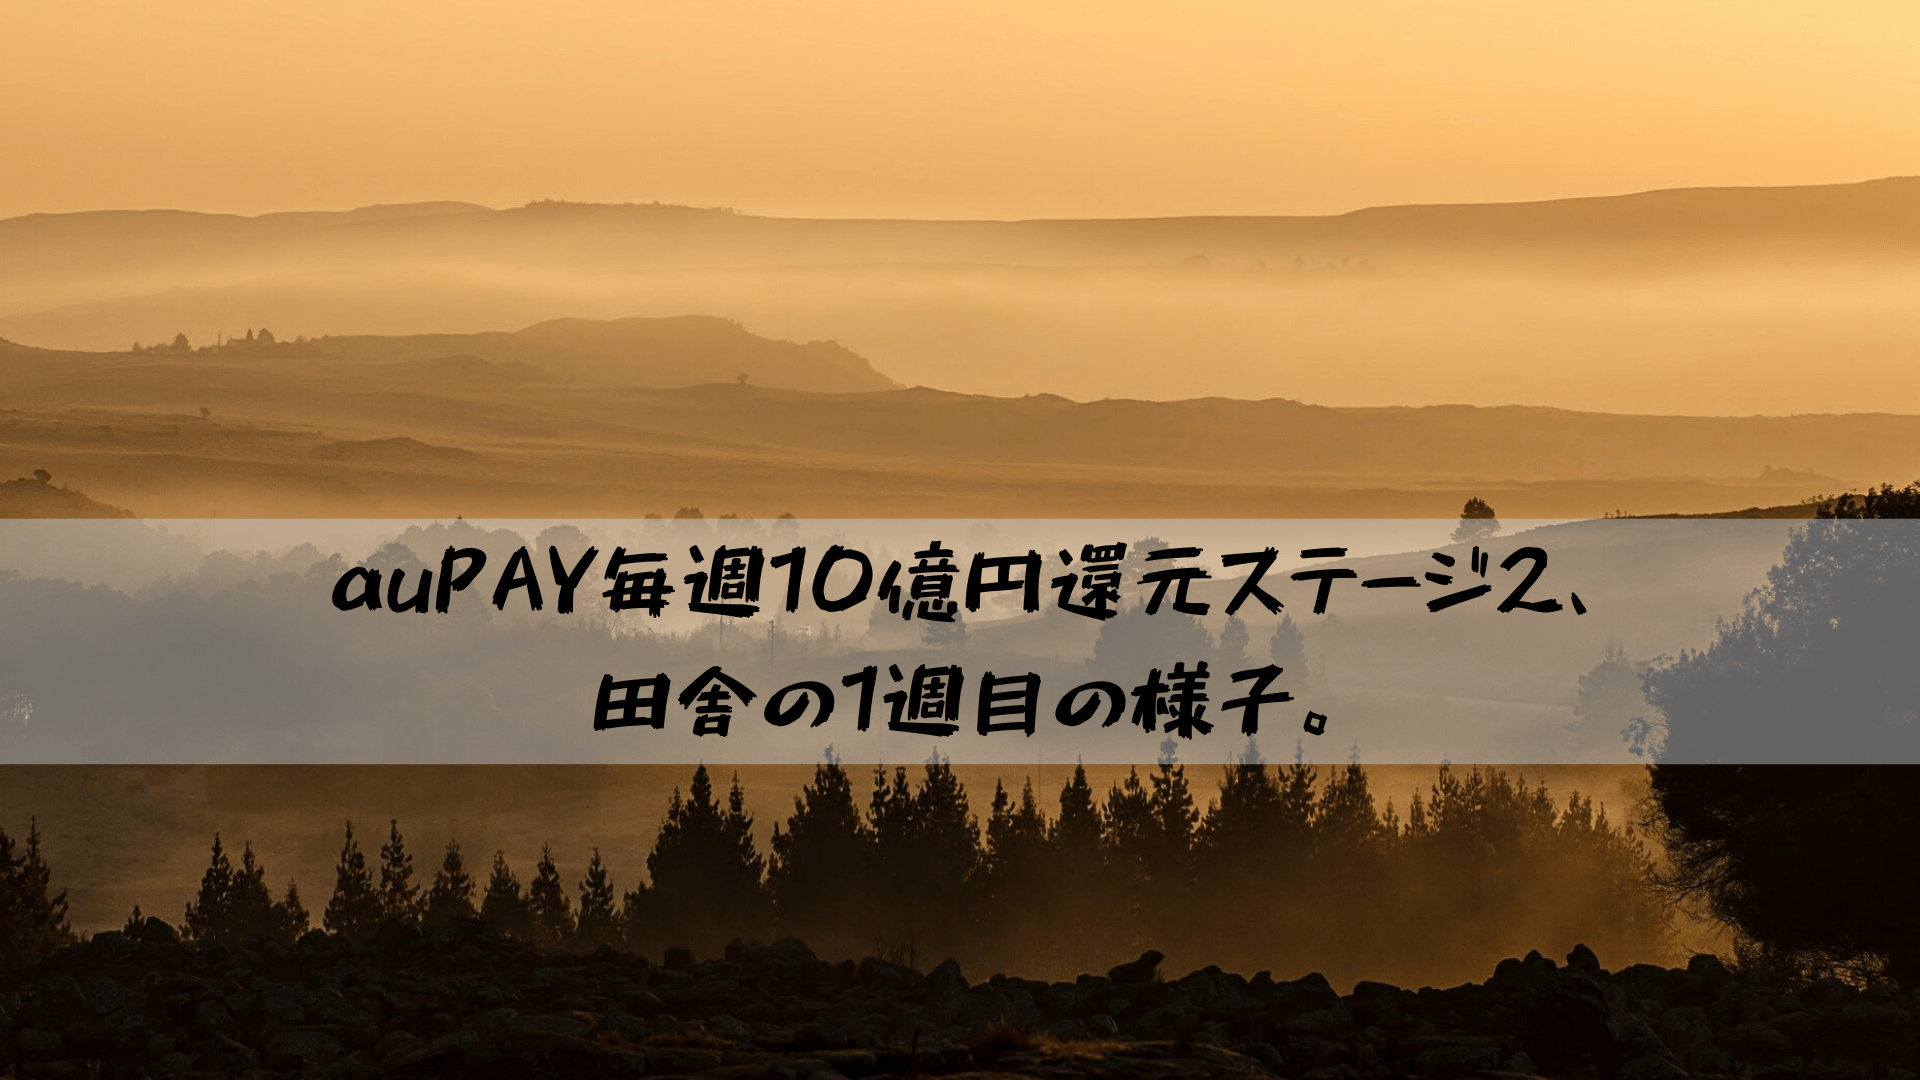 auPAY毎週10億円還元ステージ2、田舎の1週目の様子。